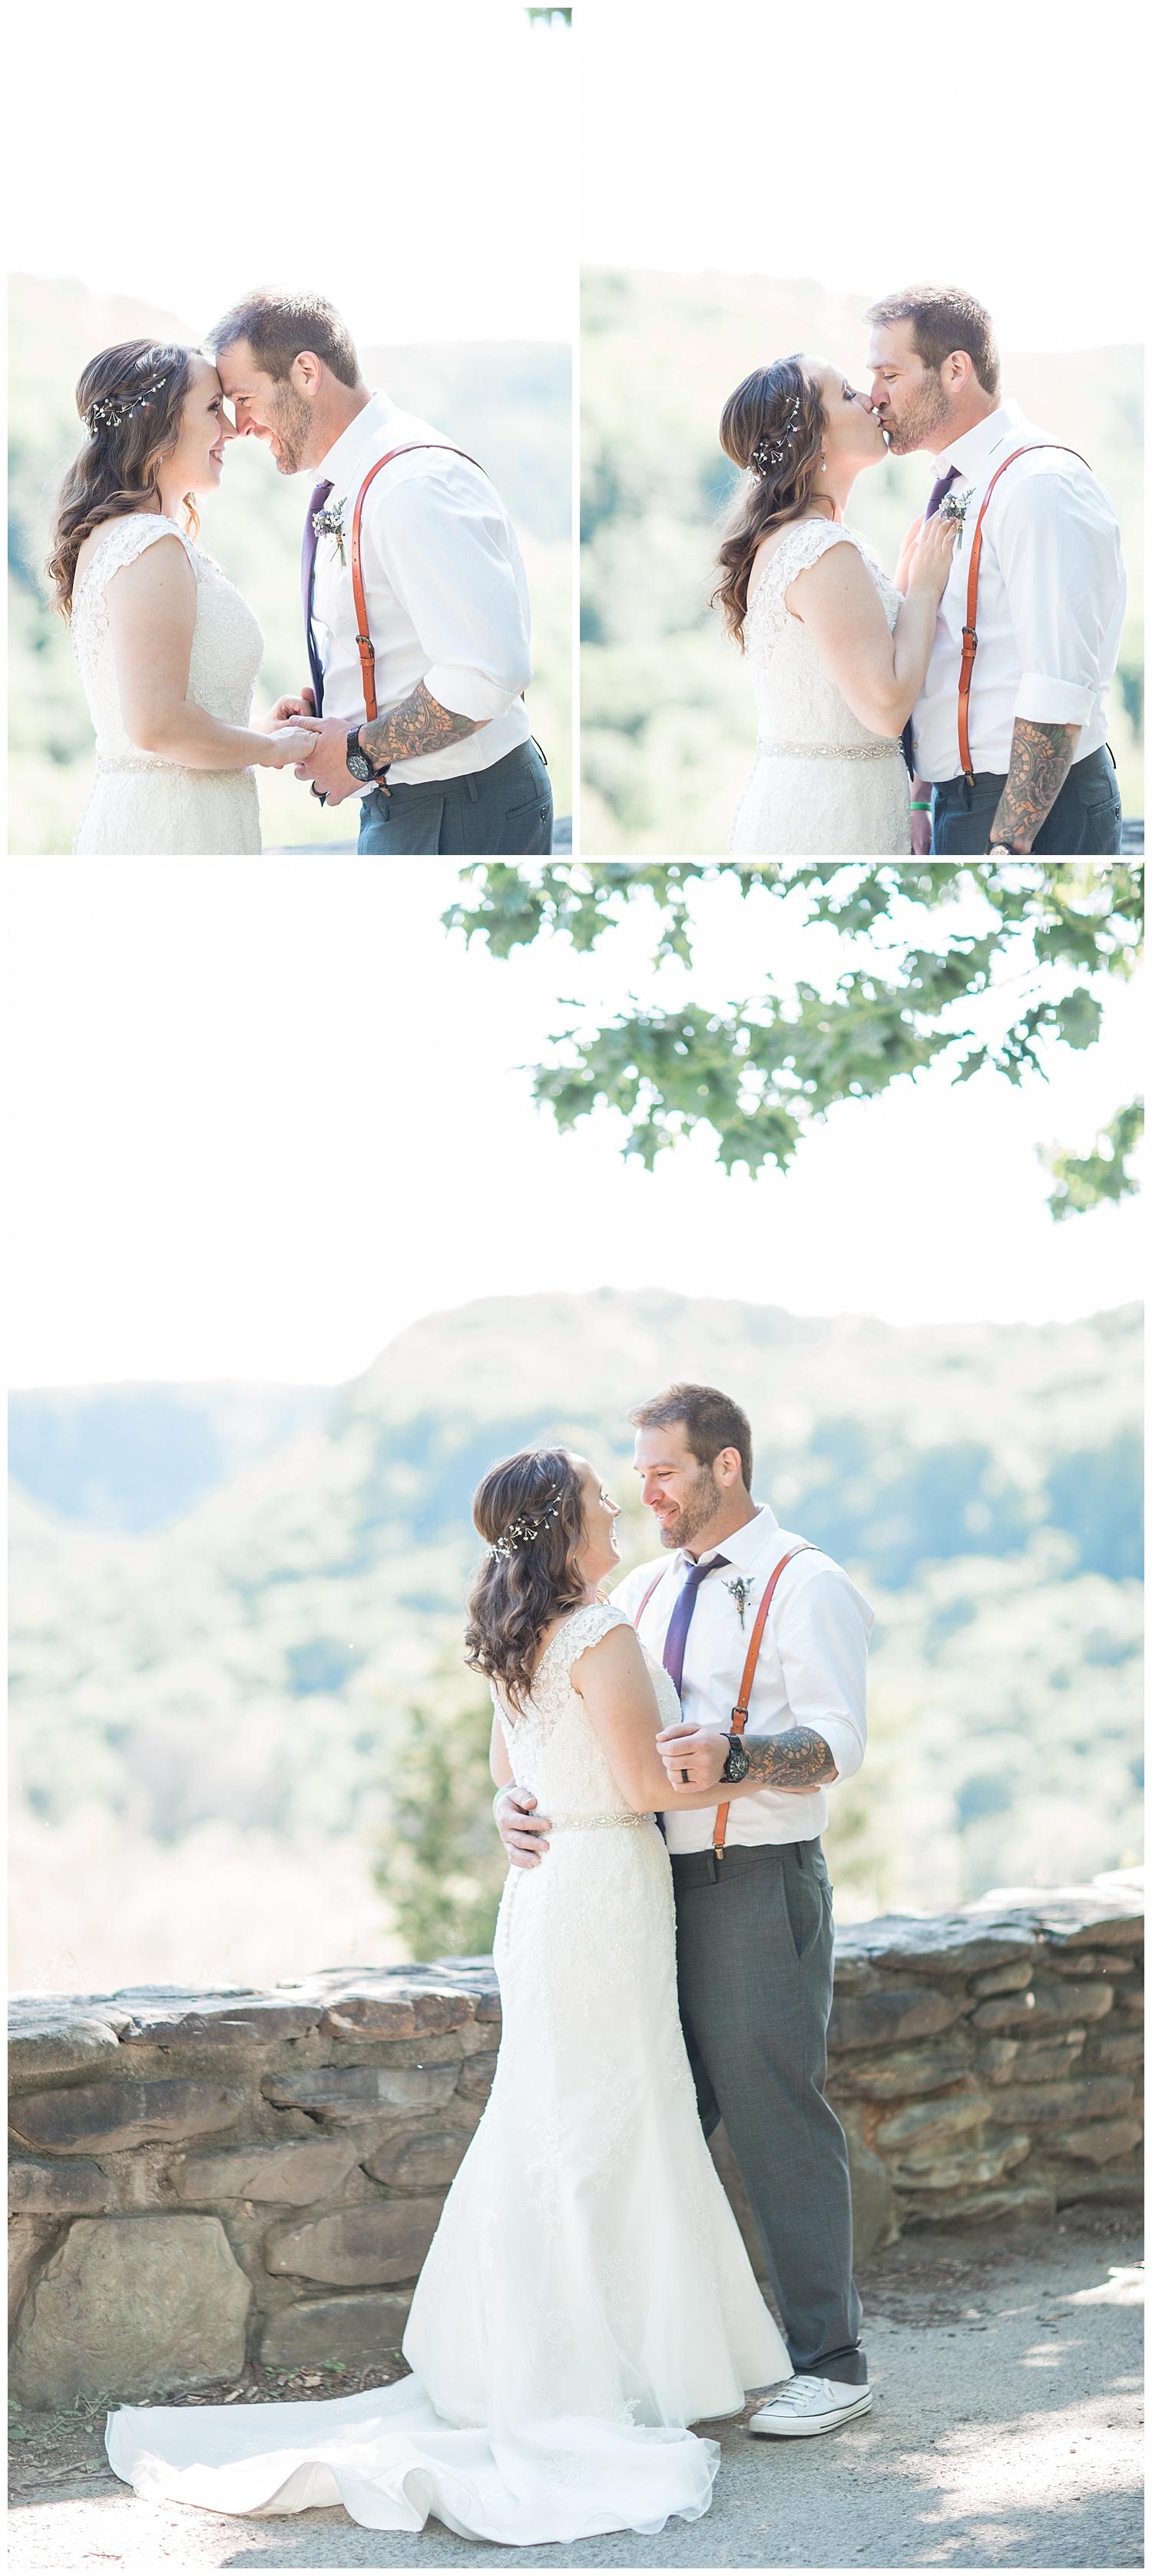 The Martin wedding - Lass & Beau-1284_Buffalo wedding photography.jpg